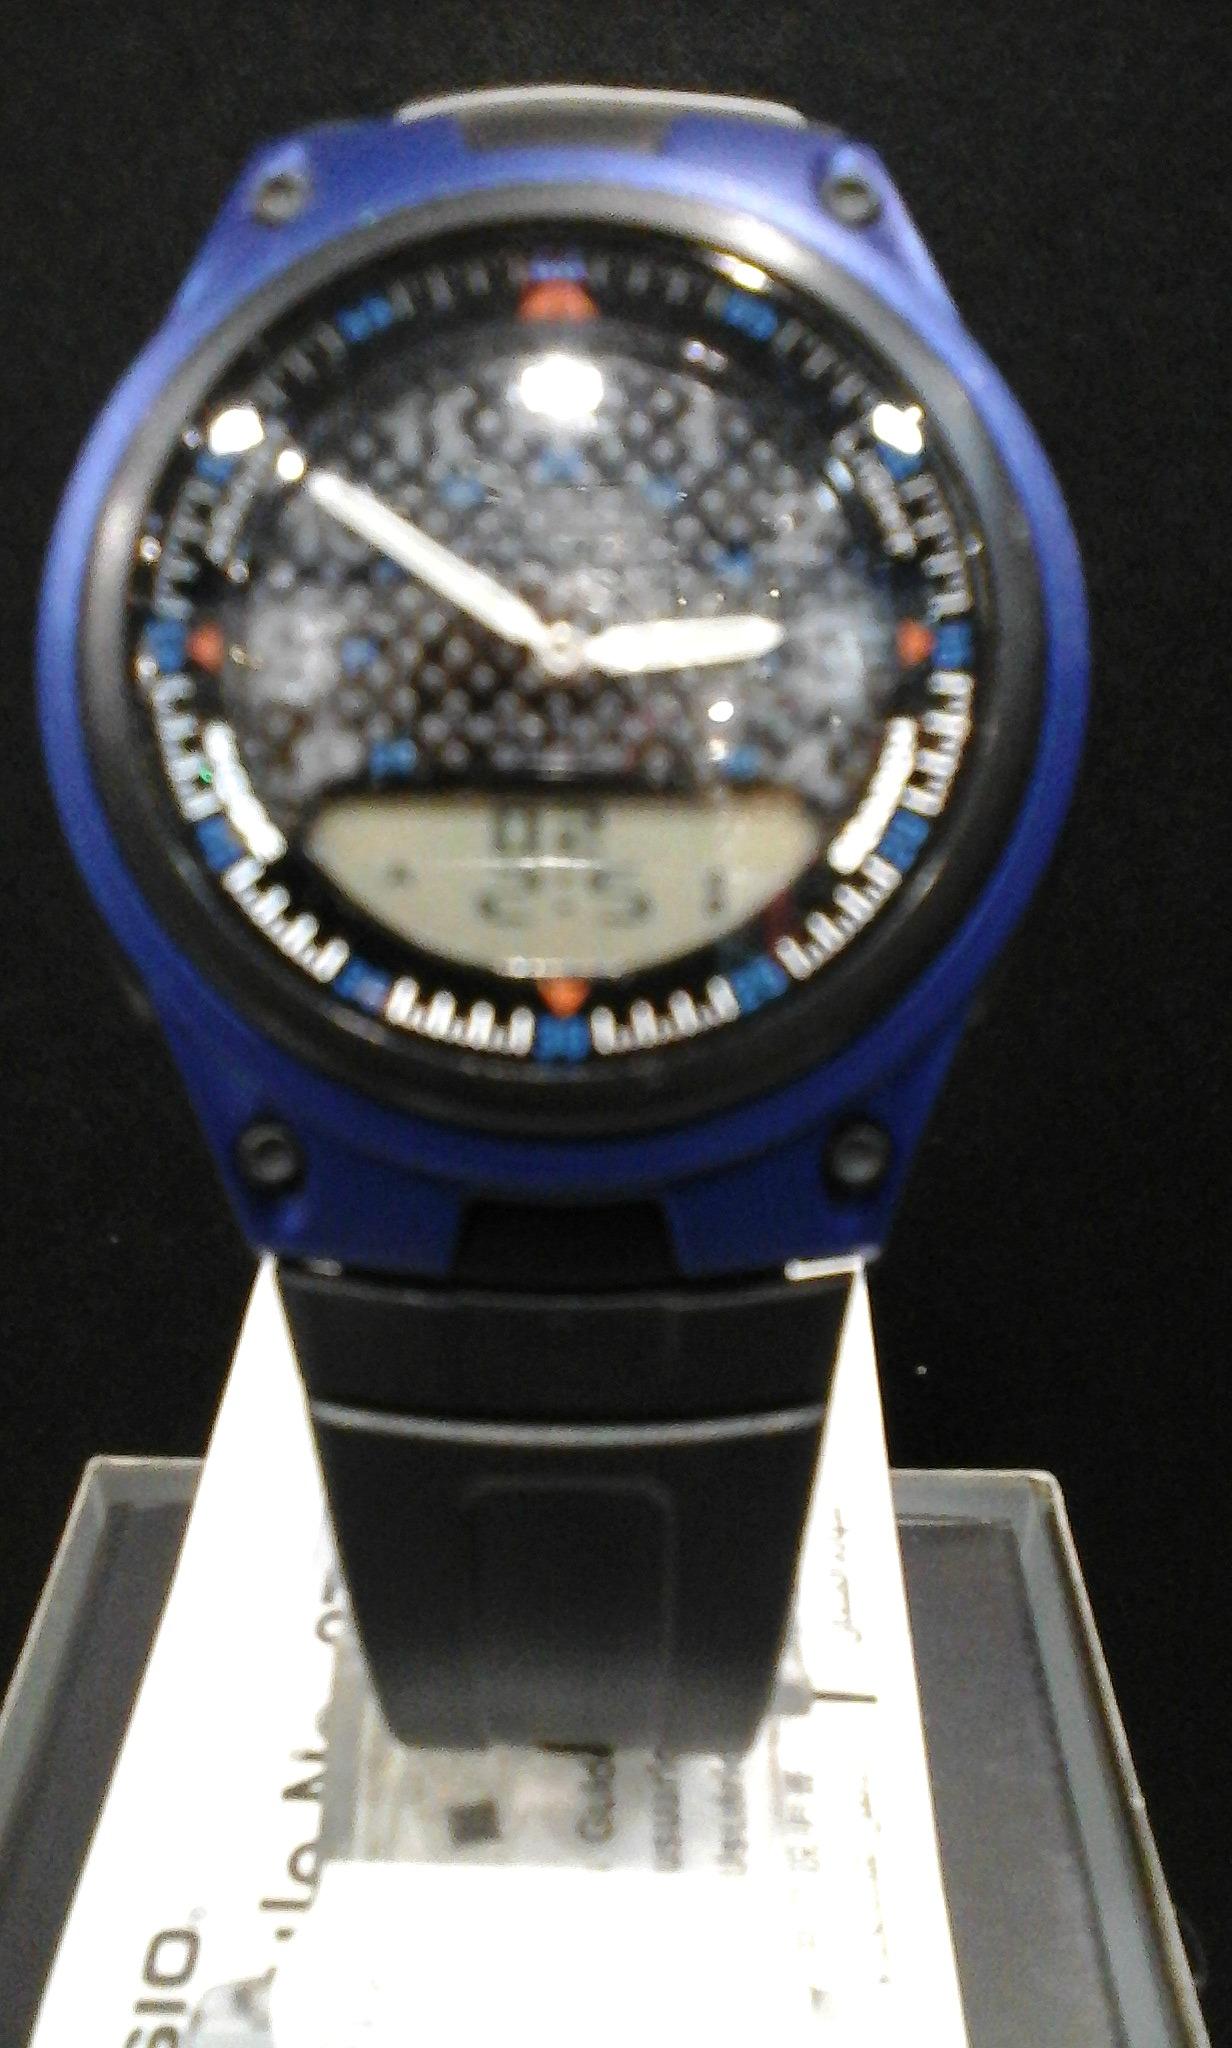 346055026543 Relojes Casio Deportivos modelos AW-80-9BVDF Y AW-80-2BVDF